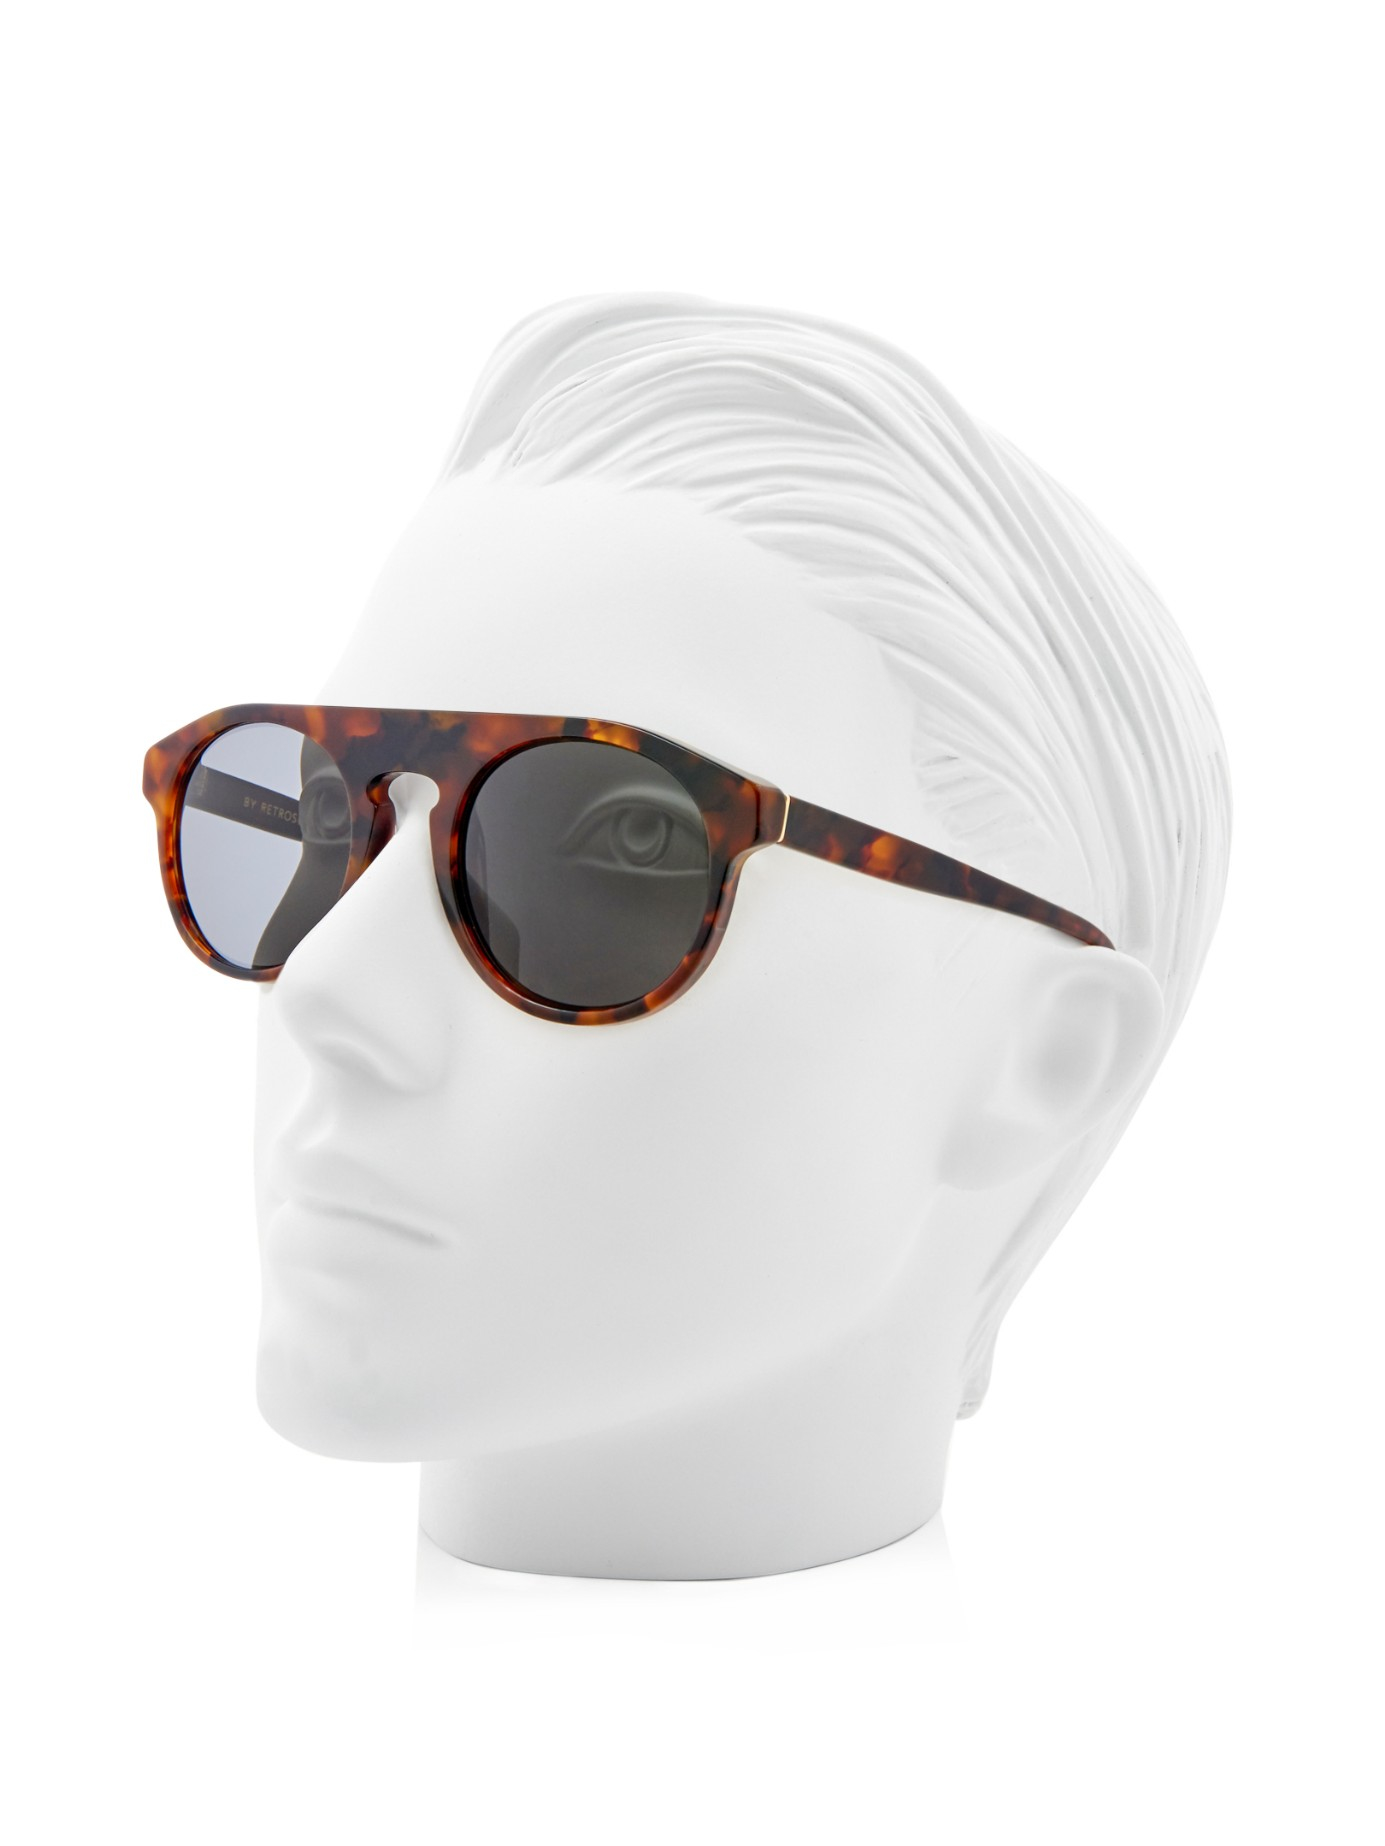 Retrosuperfuture Racer Sunglasses in Brown